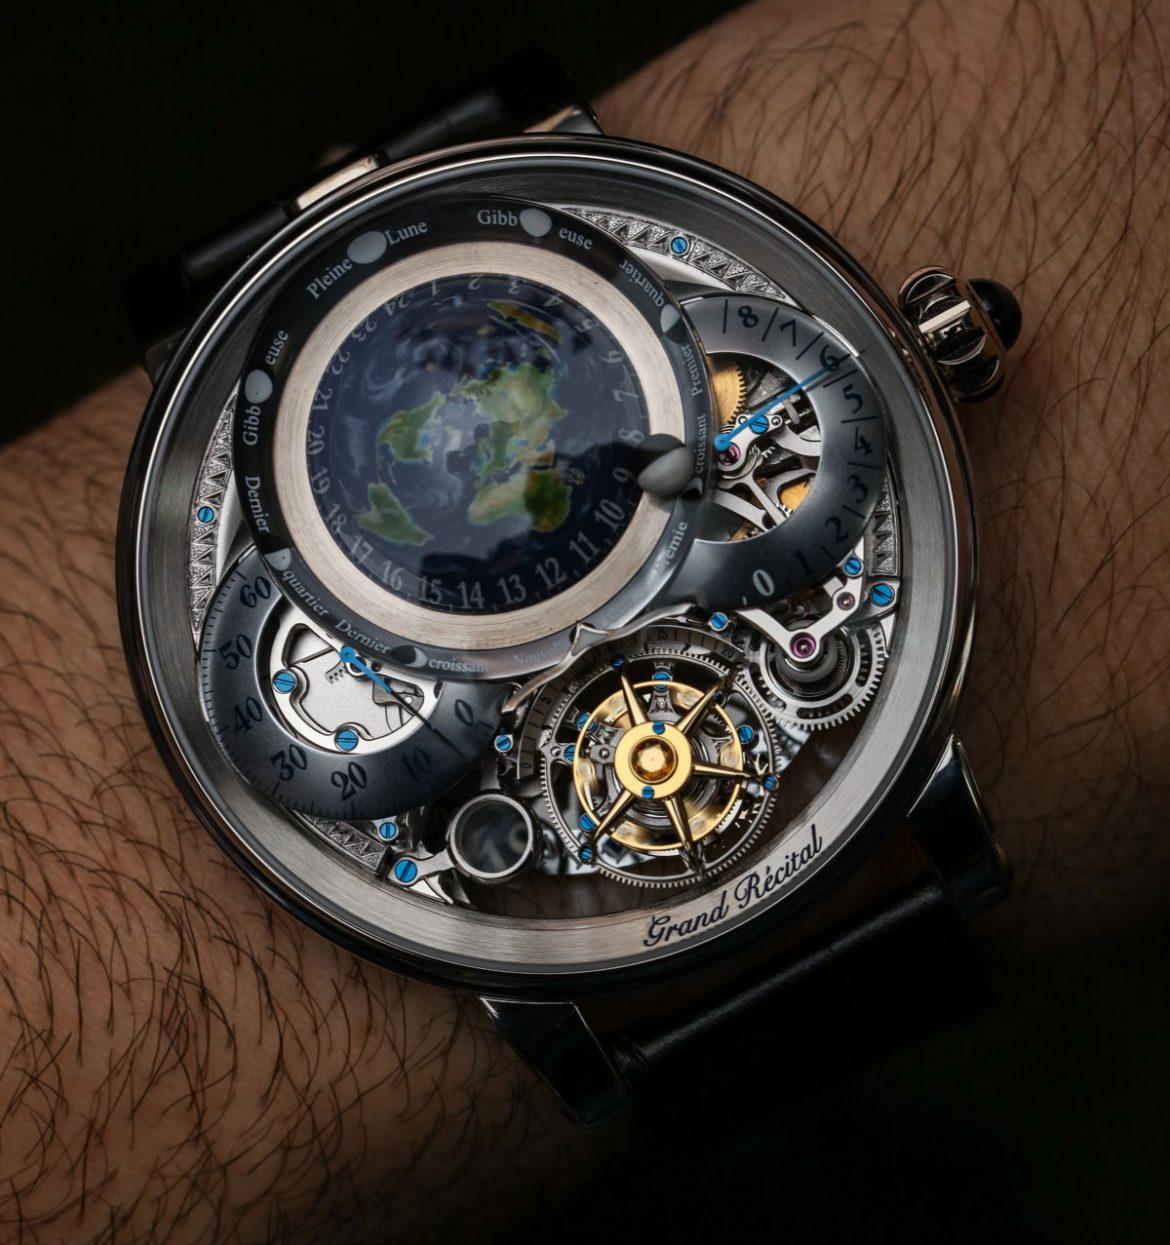 Bovet Récital 22 Grand Récital Watch Hands-On Hands-On